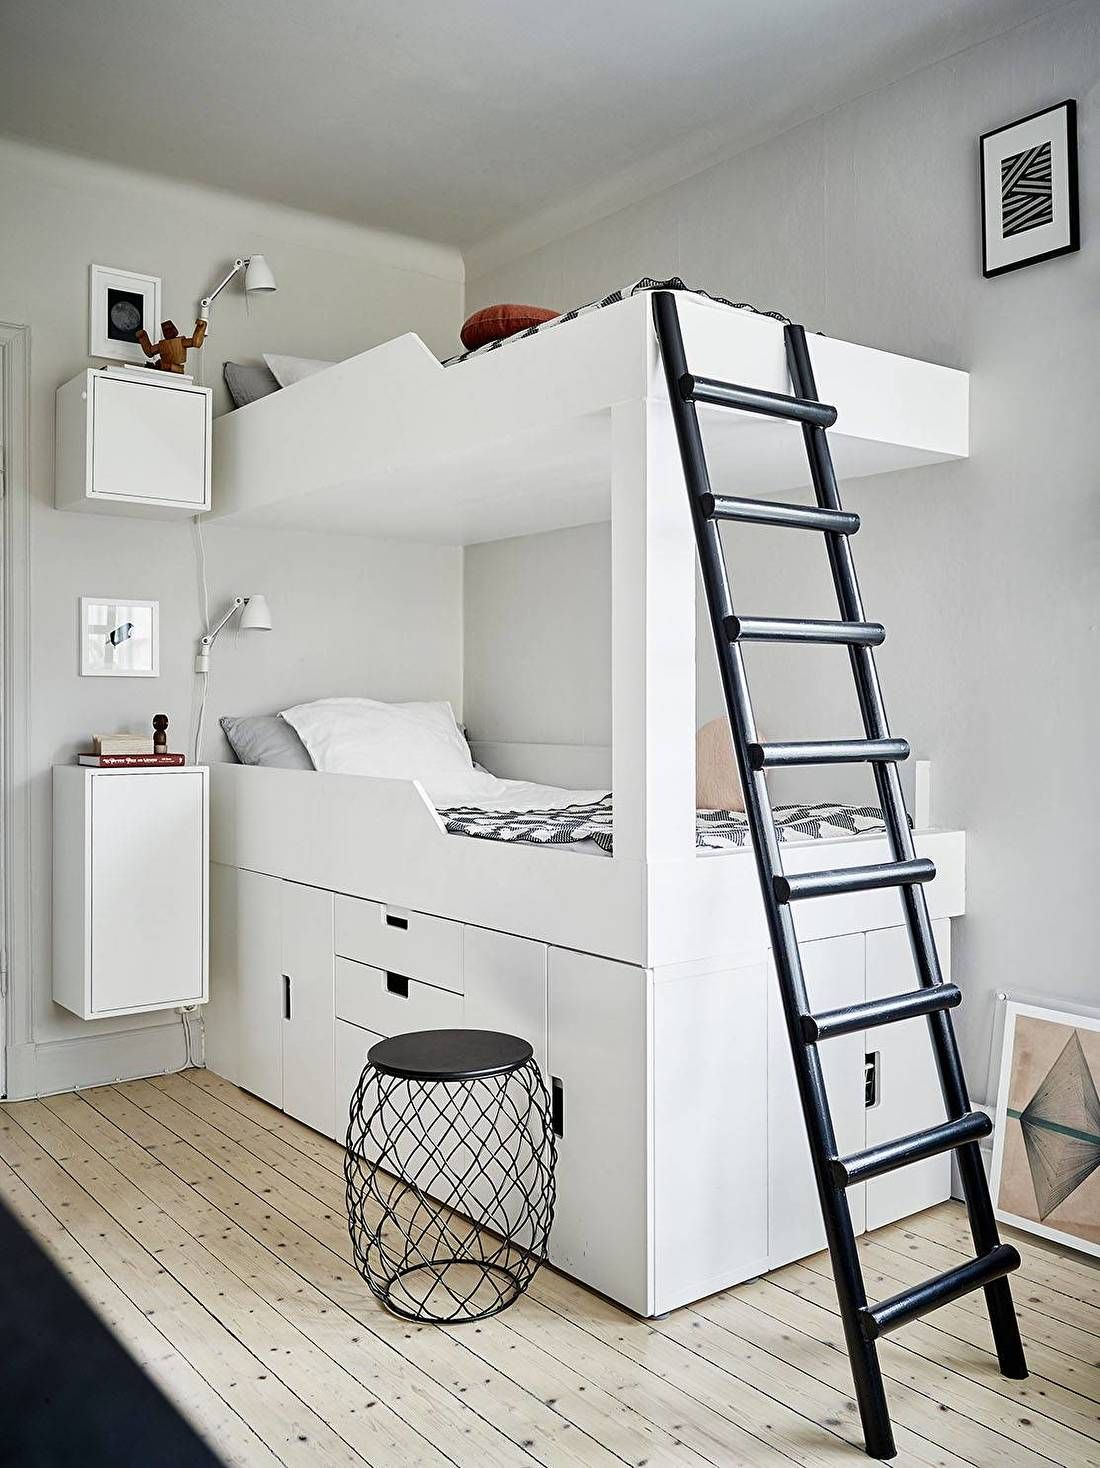 Spiksplinternieuw ikeahack stuva hoogslaper stapelbed | Ikea Hacks and Ikea Love in EY-21